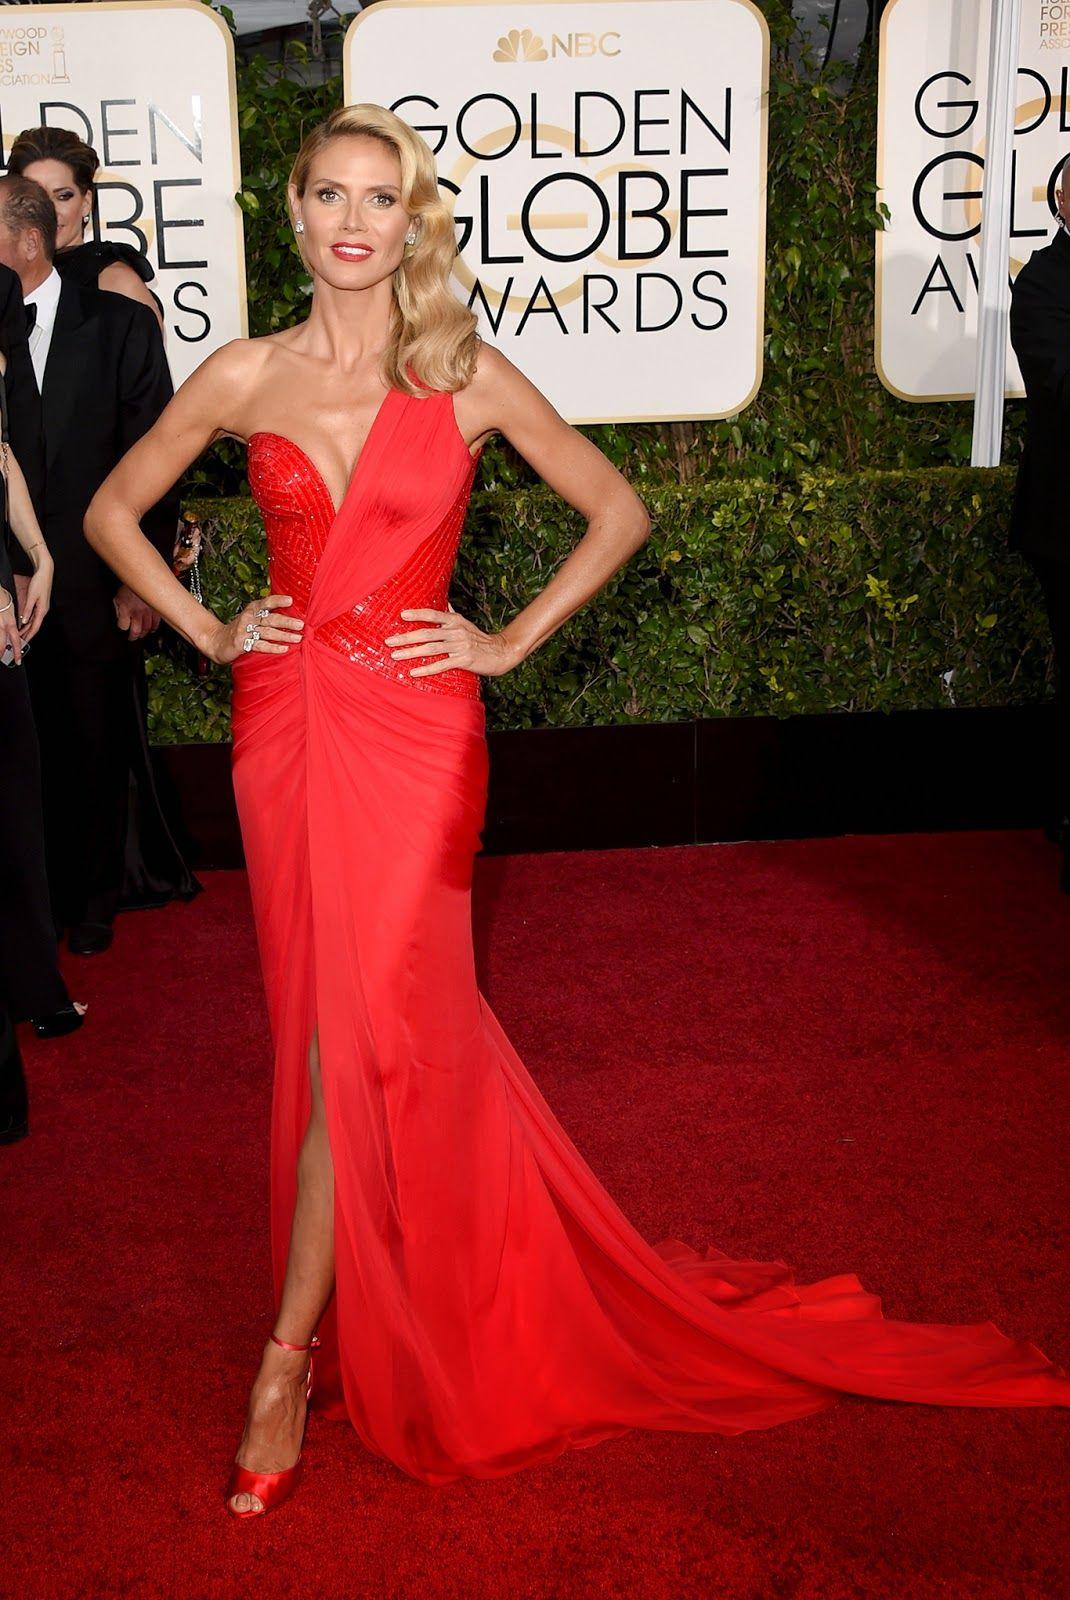 Heidi Klum in an Atelier Versace dress. ♥ If you enjoyed my pin ...